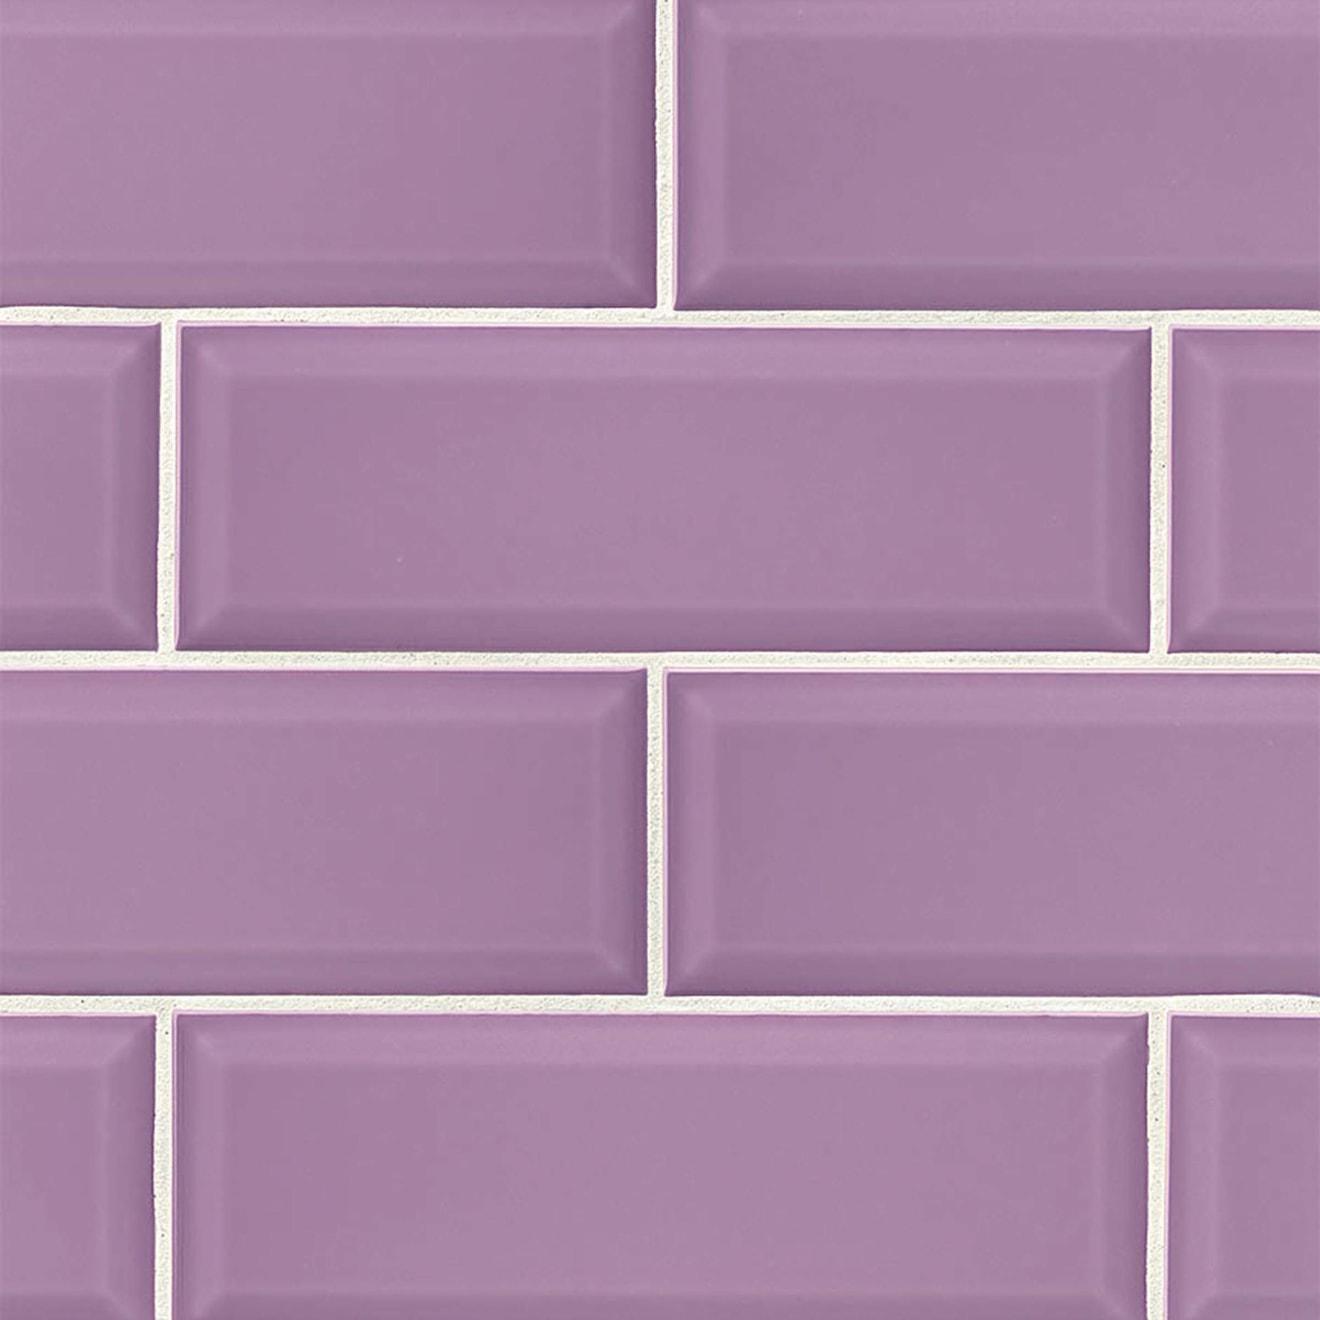 "Adamas 4"" x 12"" Wall Tile in Viola"